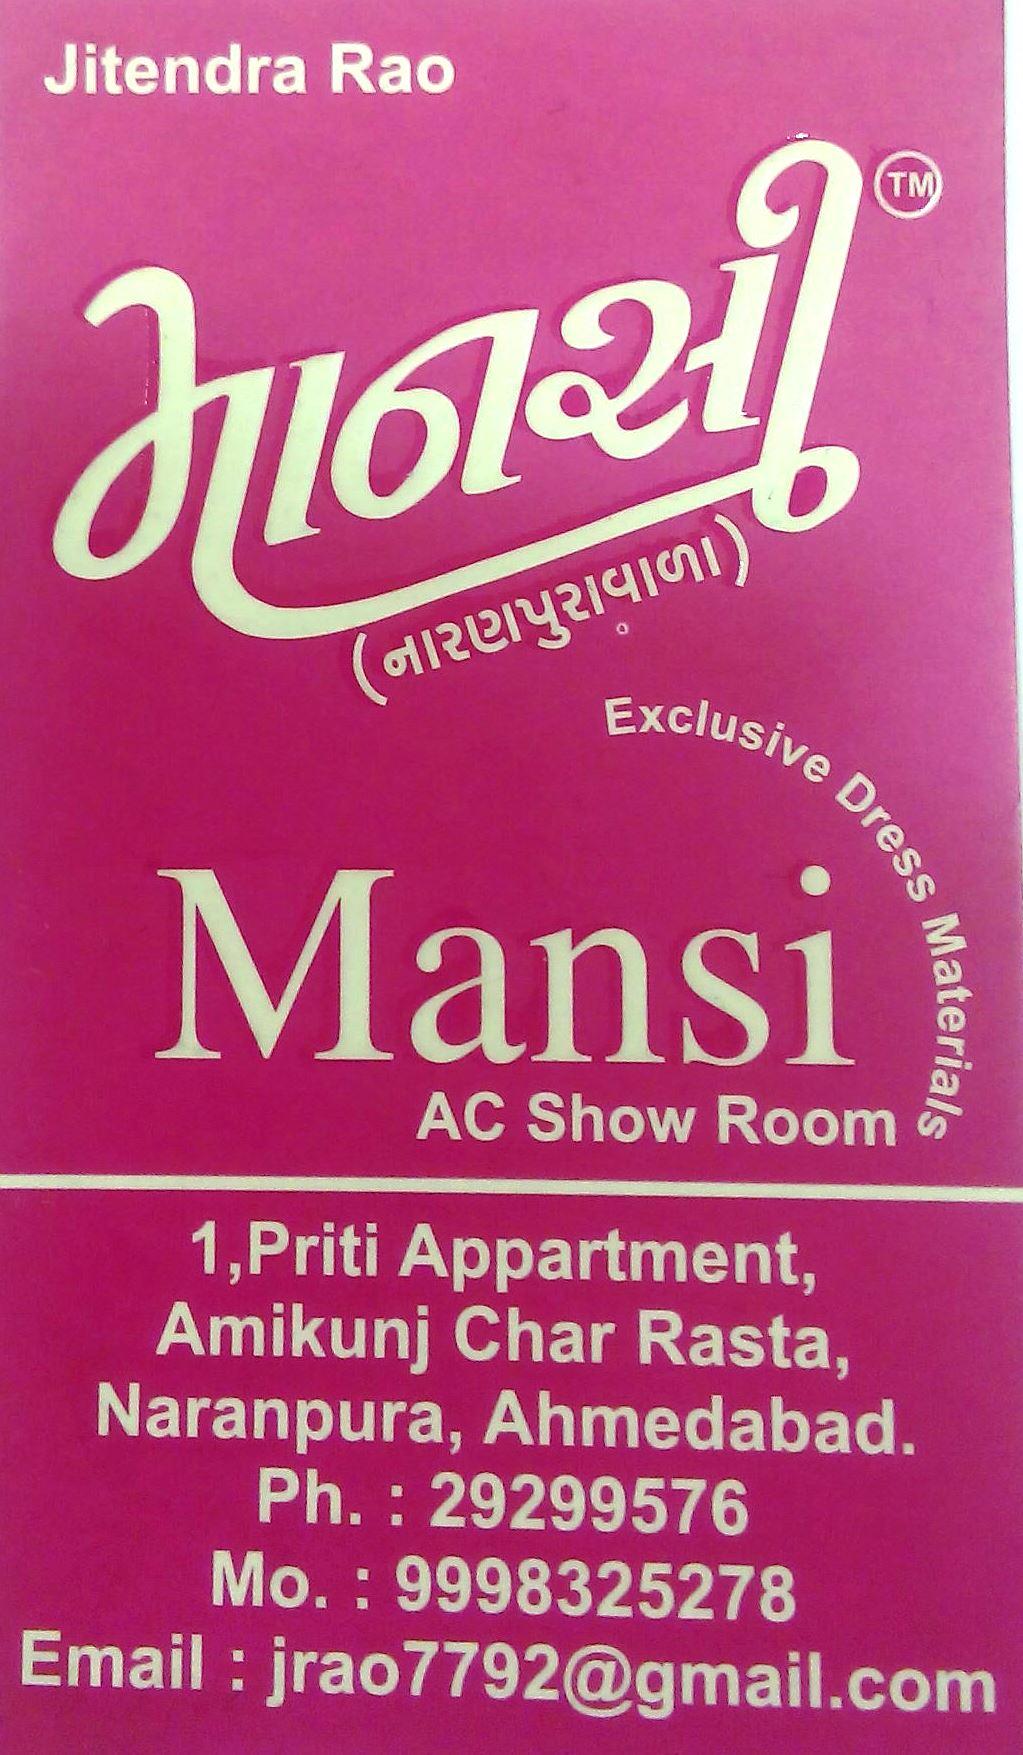 Mansi Junction